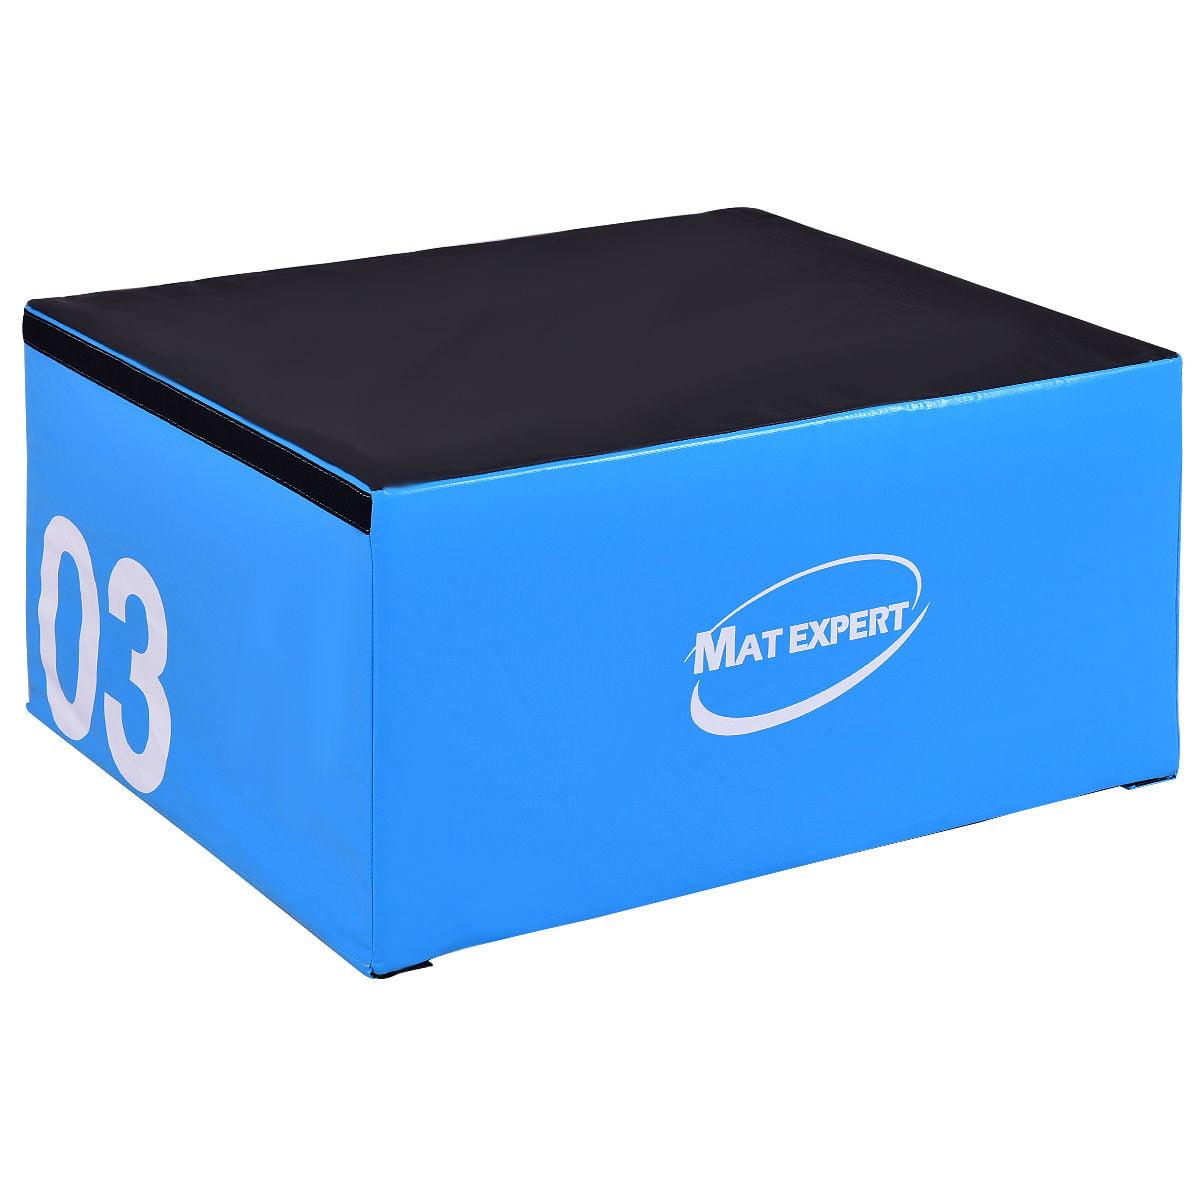 Gymax 18'' PVC Soft Foam Jumping Box Plyometric Exercise Blue